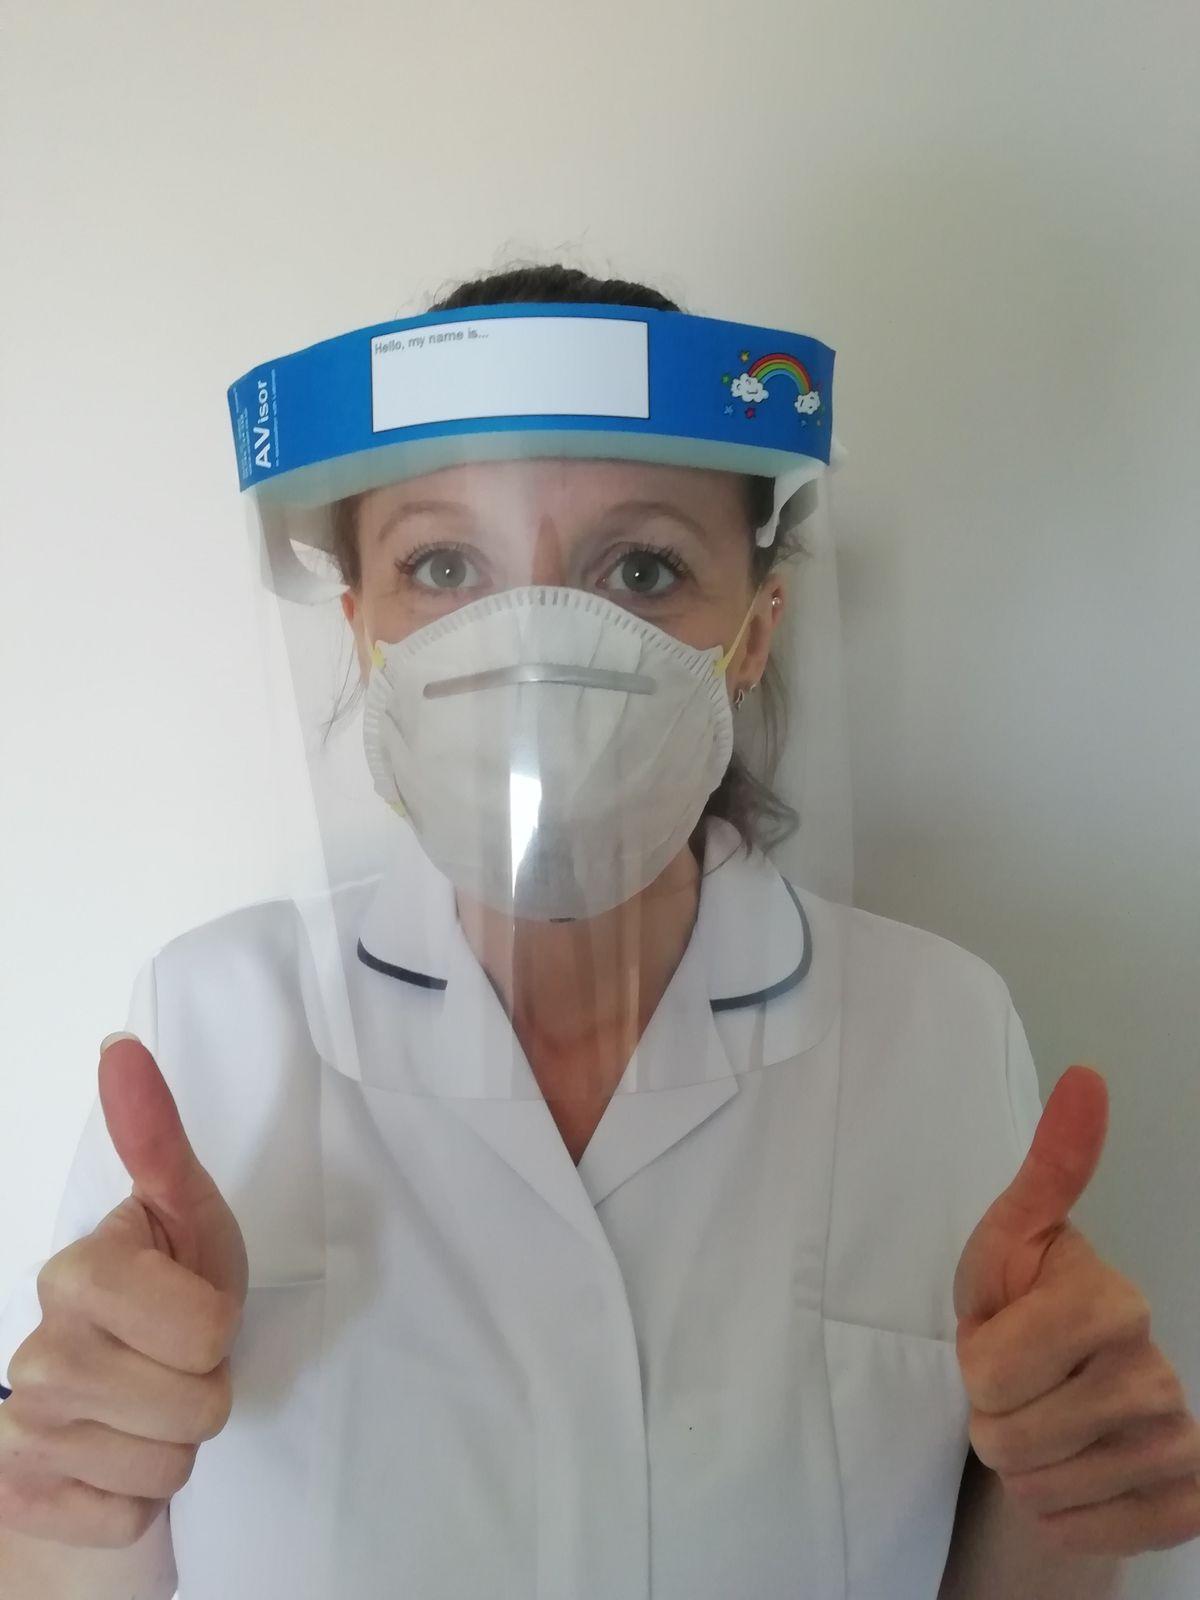 A health worker wears a visor